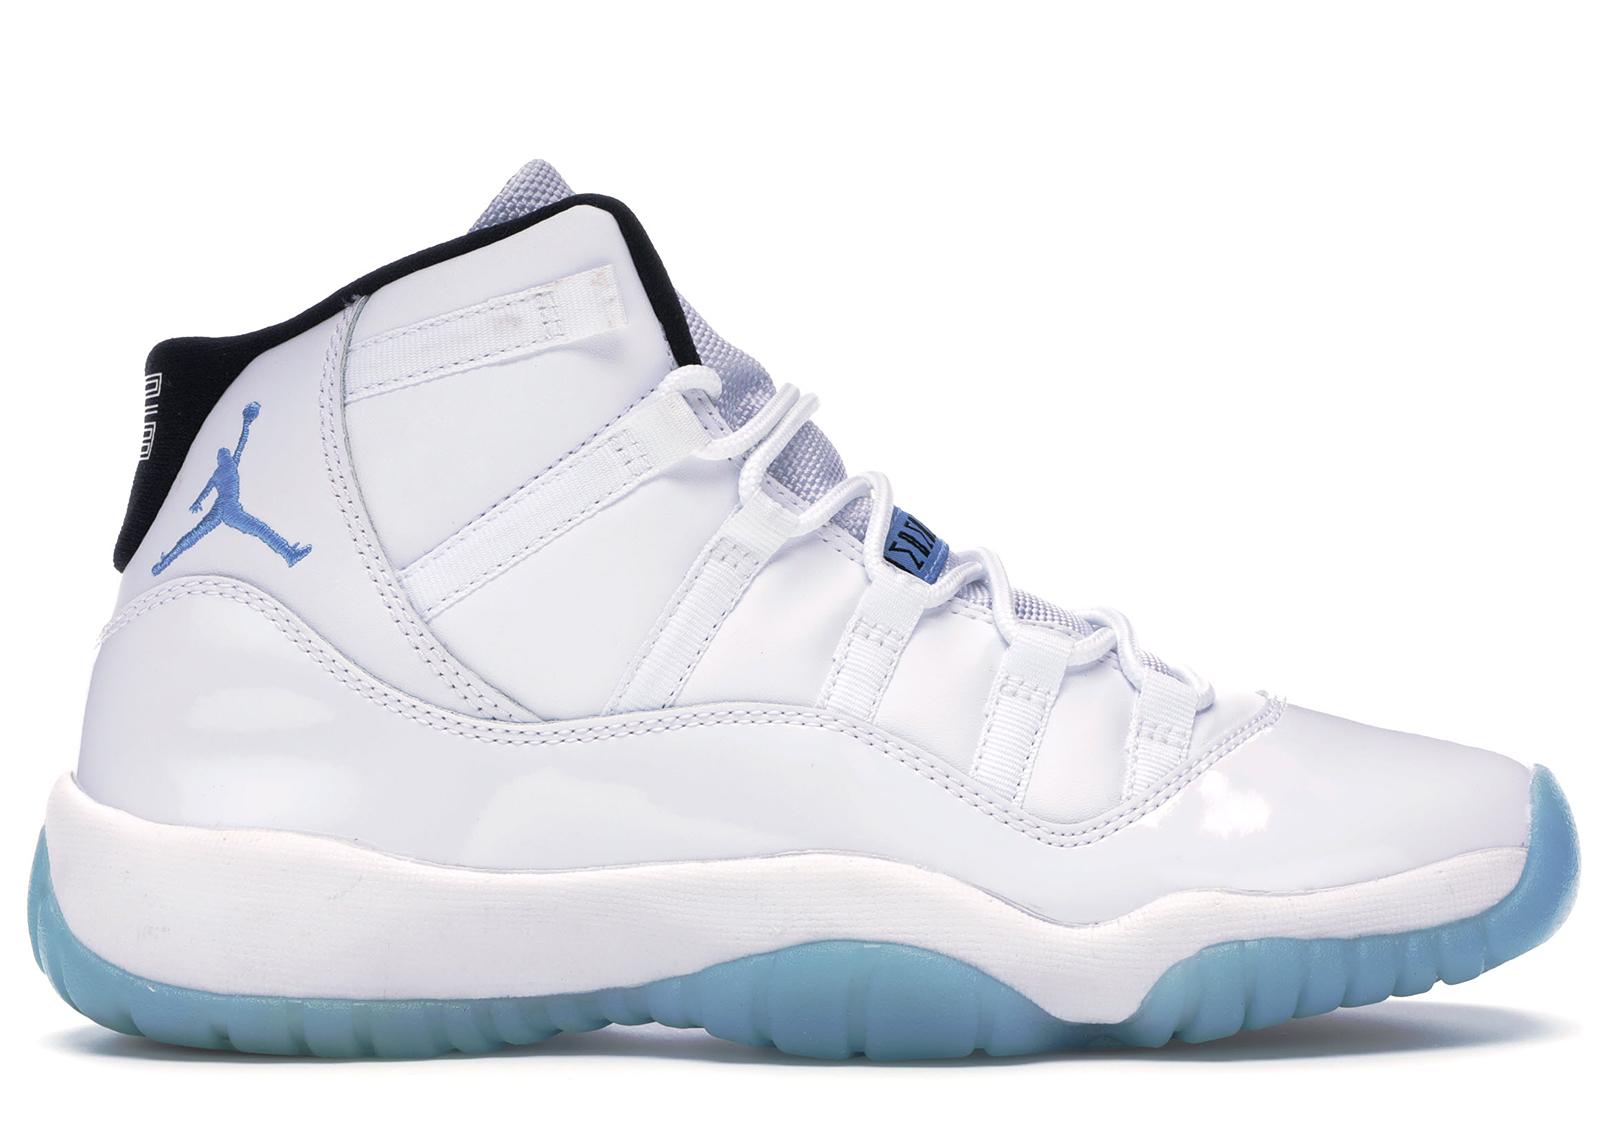 Jordan 11 Retro Legend Blue 2014 (GS